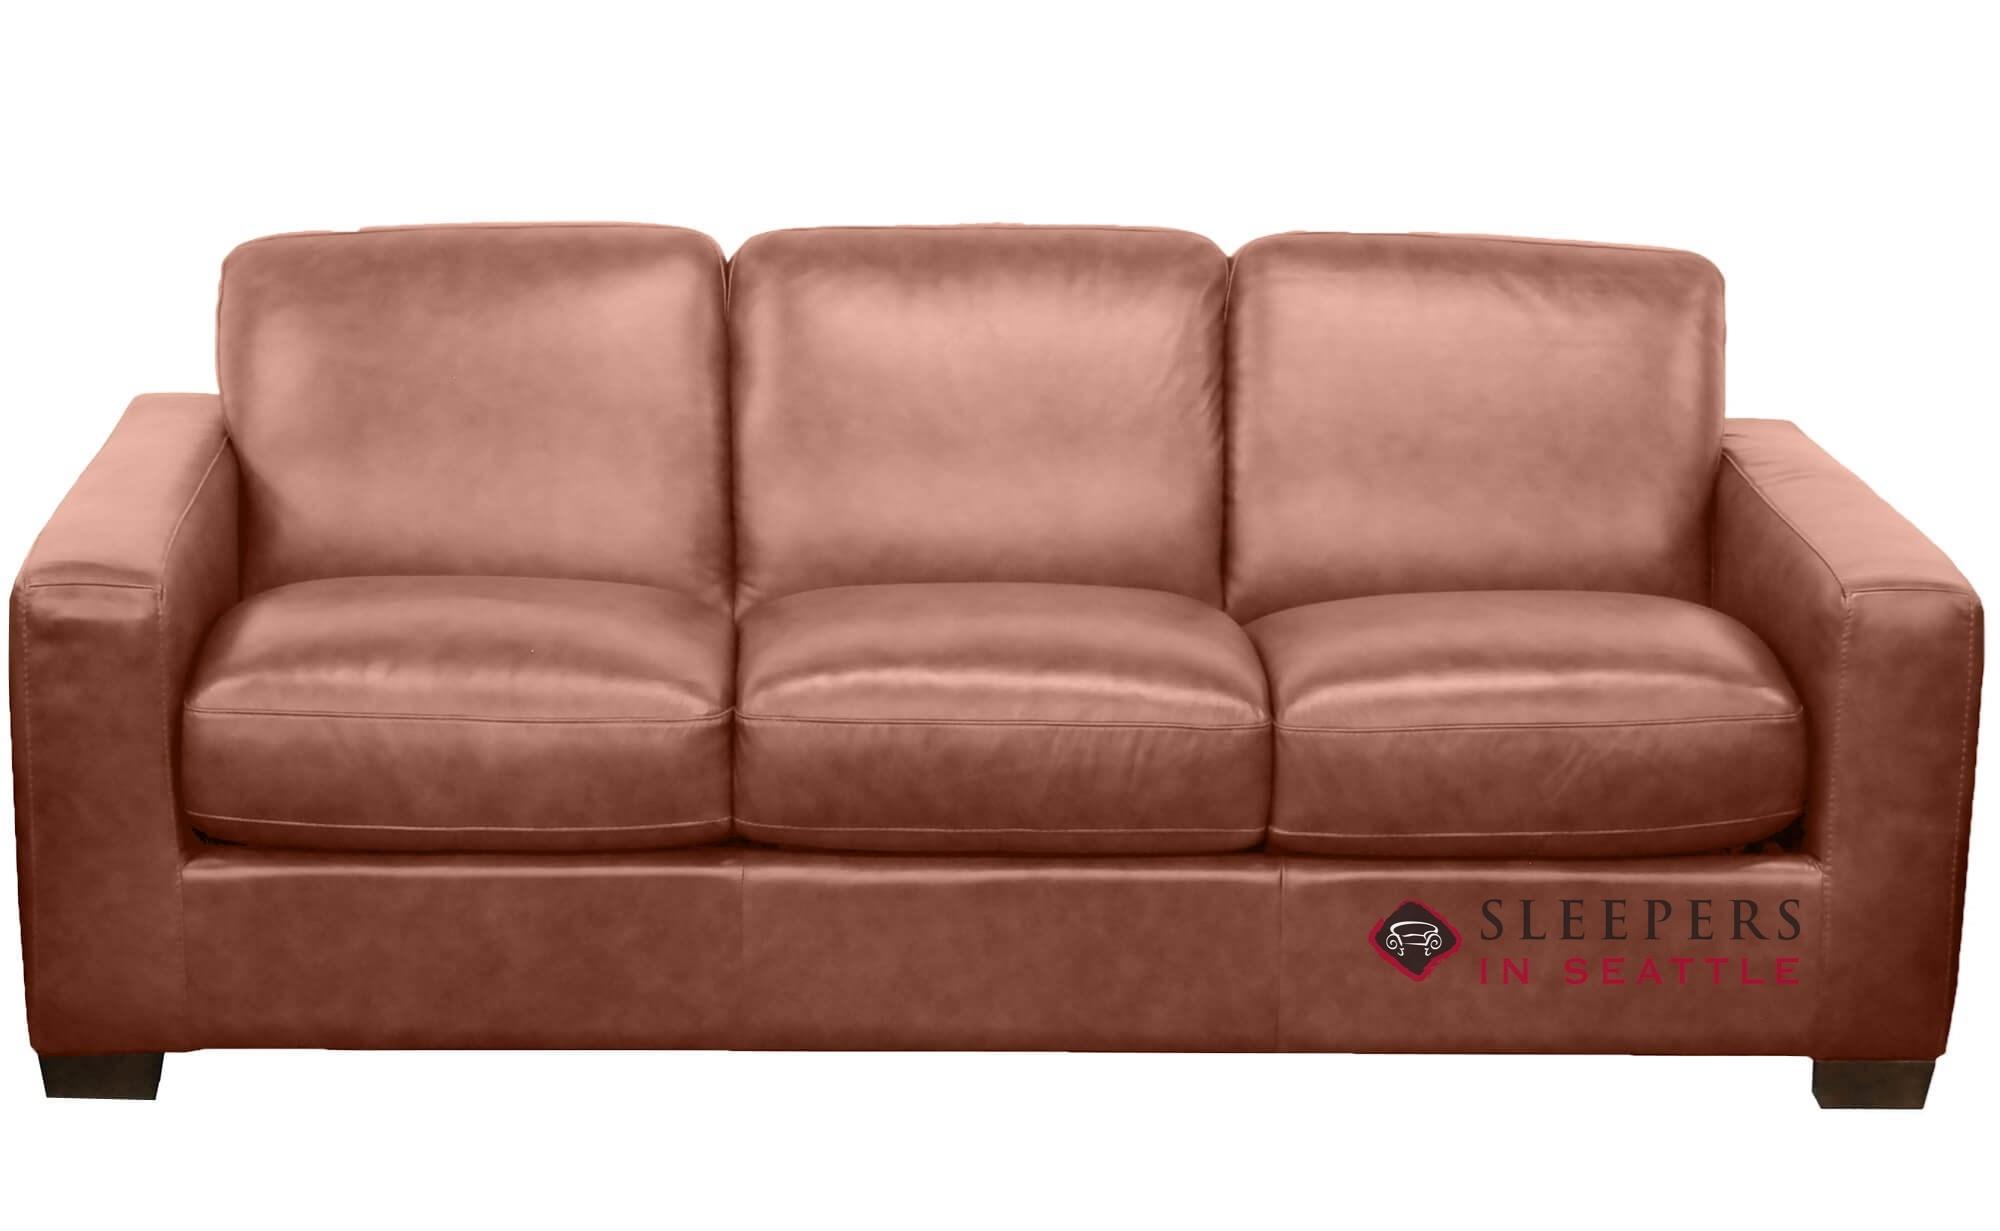 Rubicon B534 Leather Sleeper Sofa